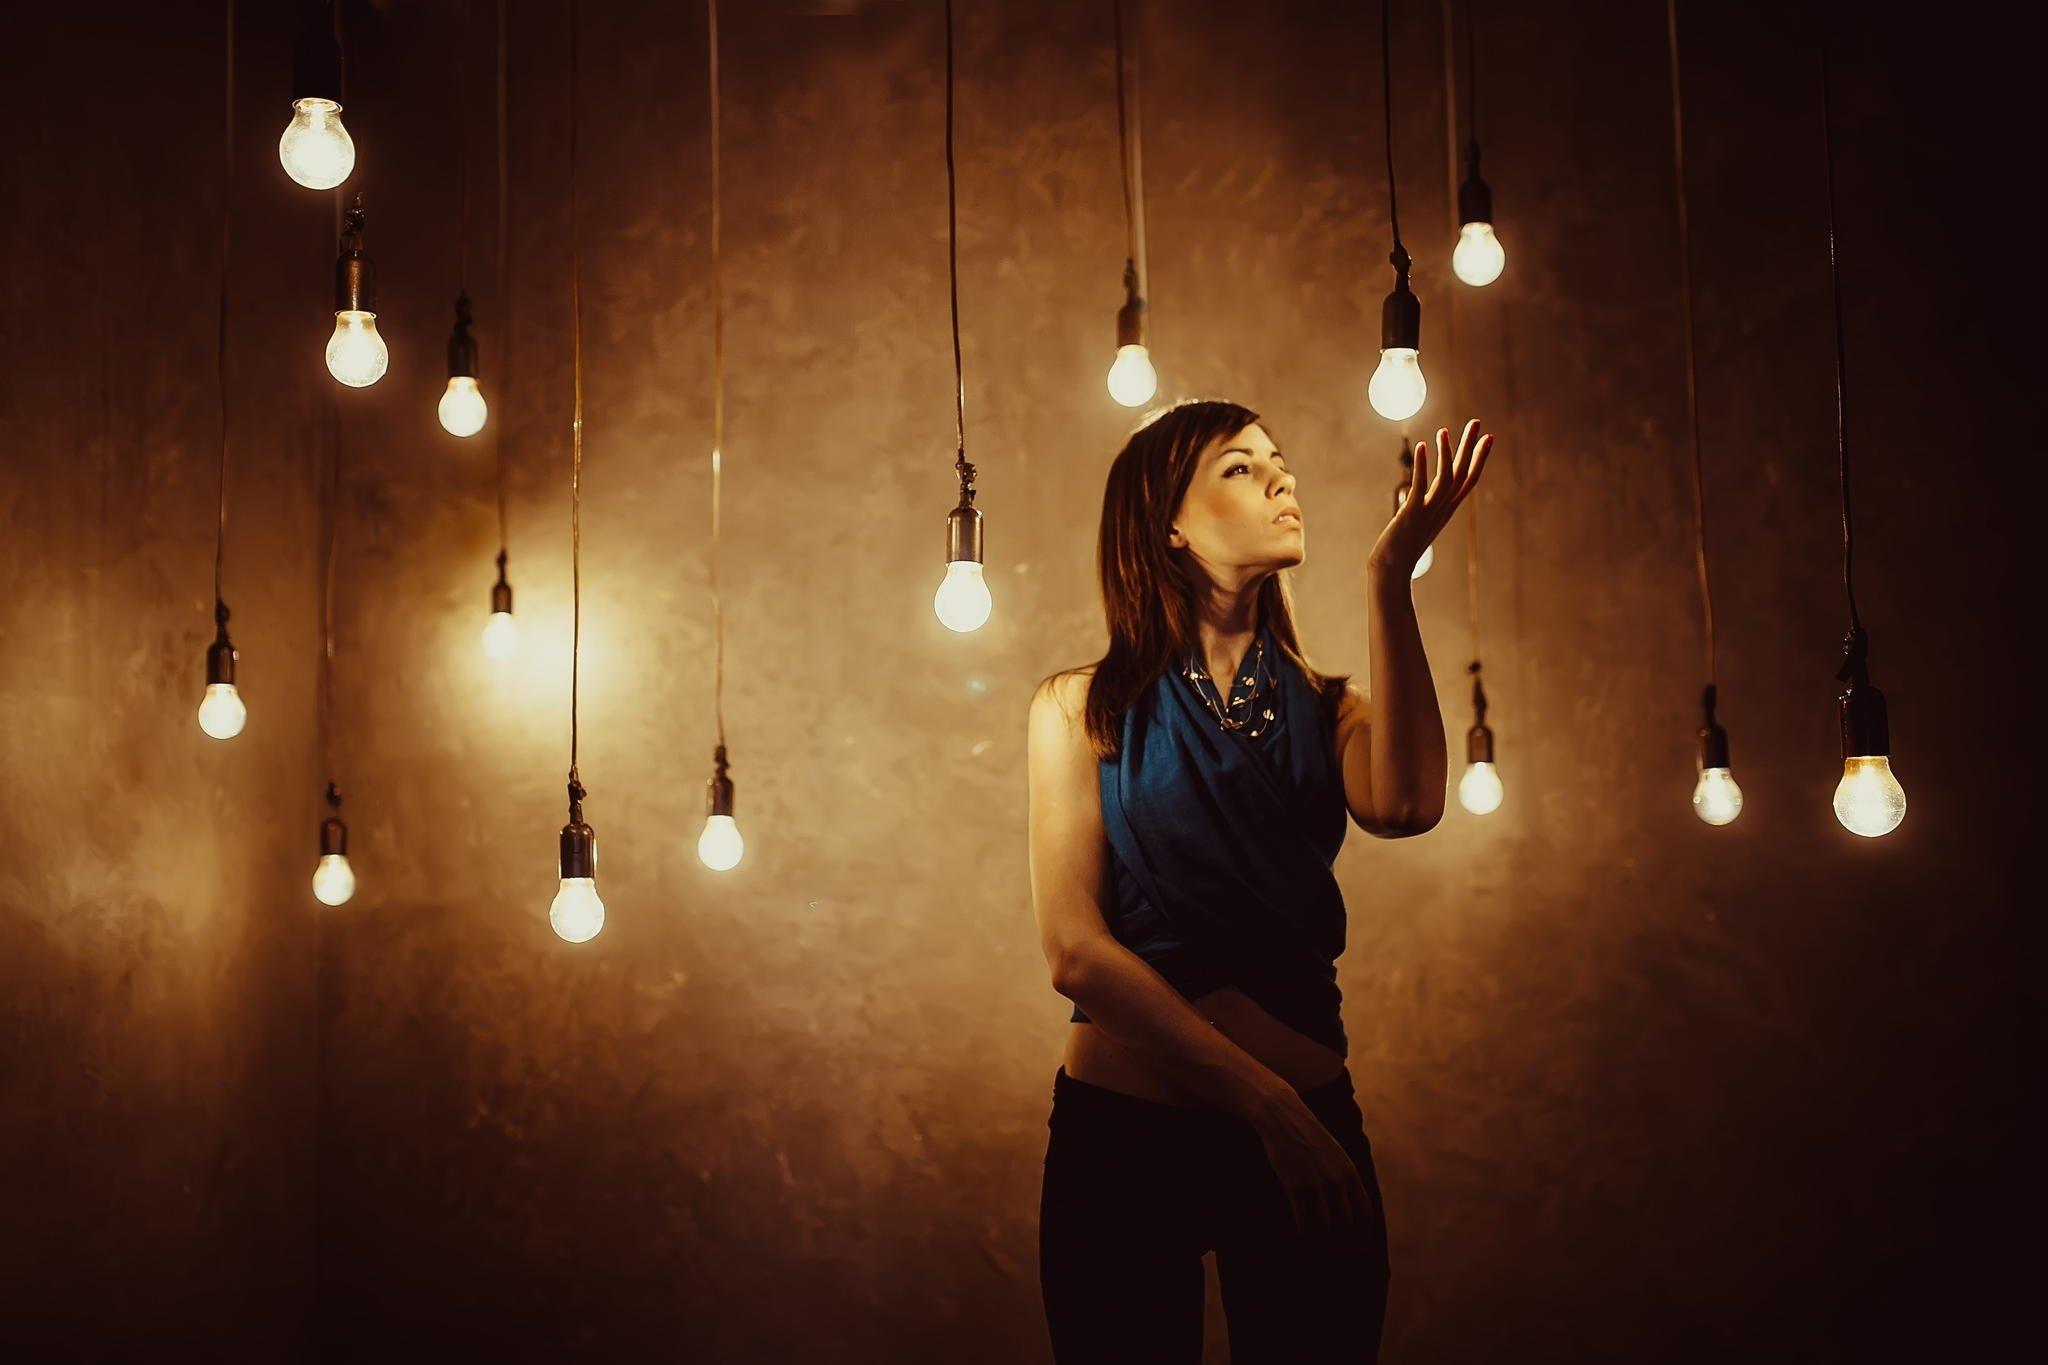 10 Stylish Startup Ideas We D Like To Fund startup ideas wed like to fund james riney